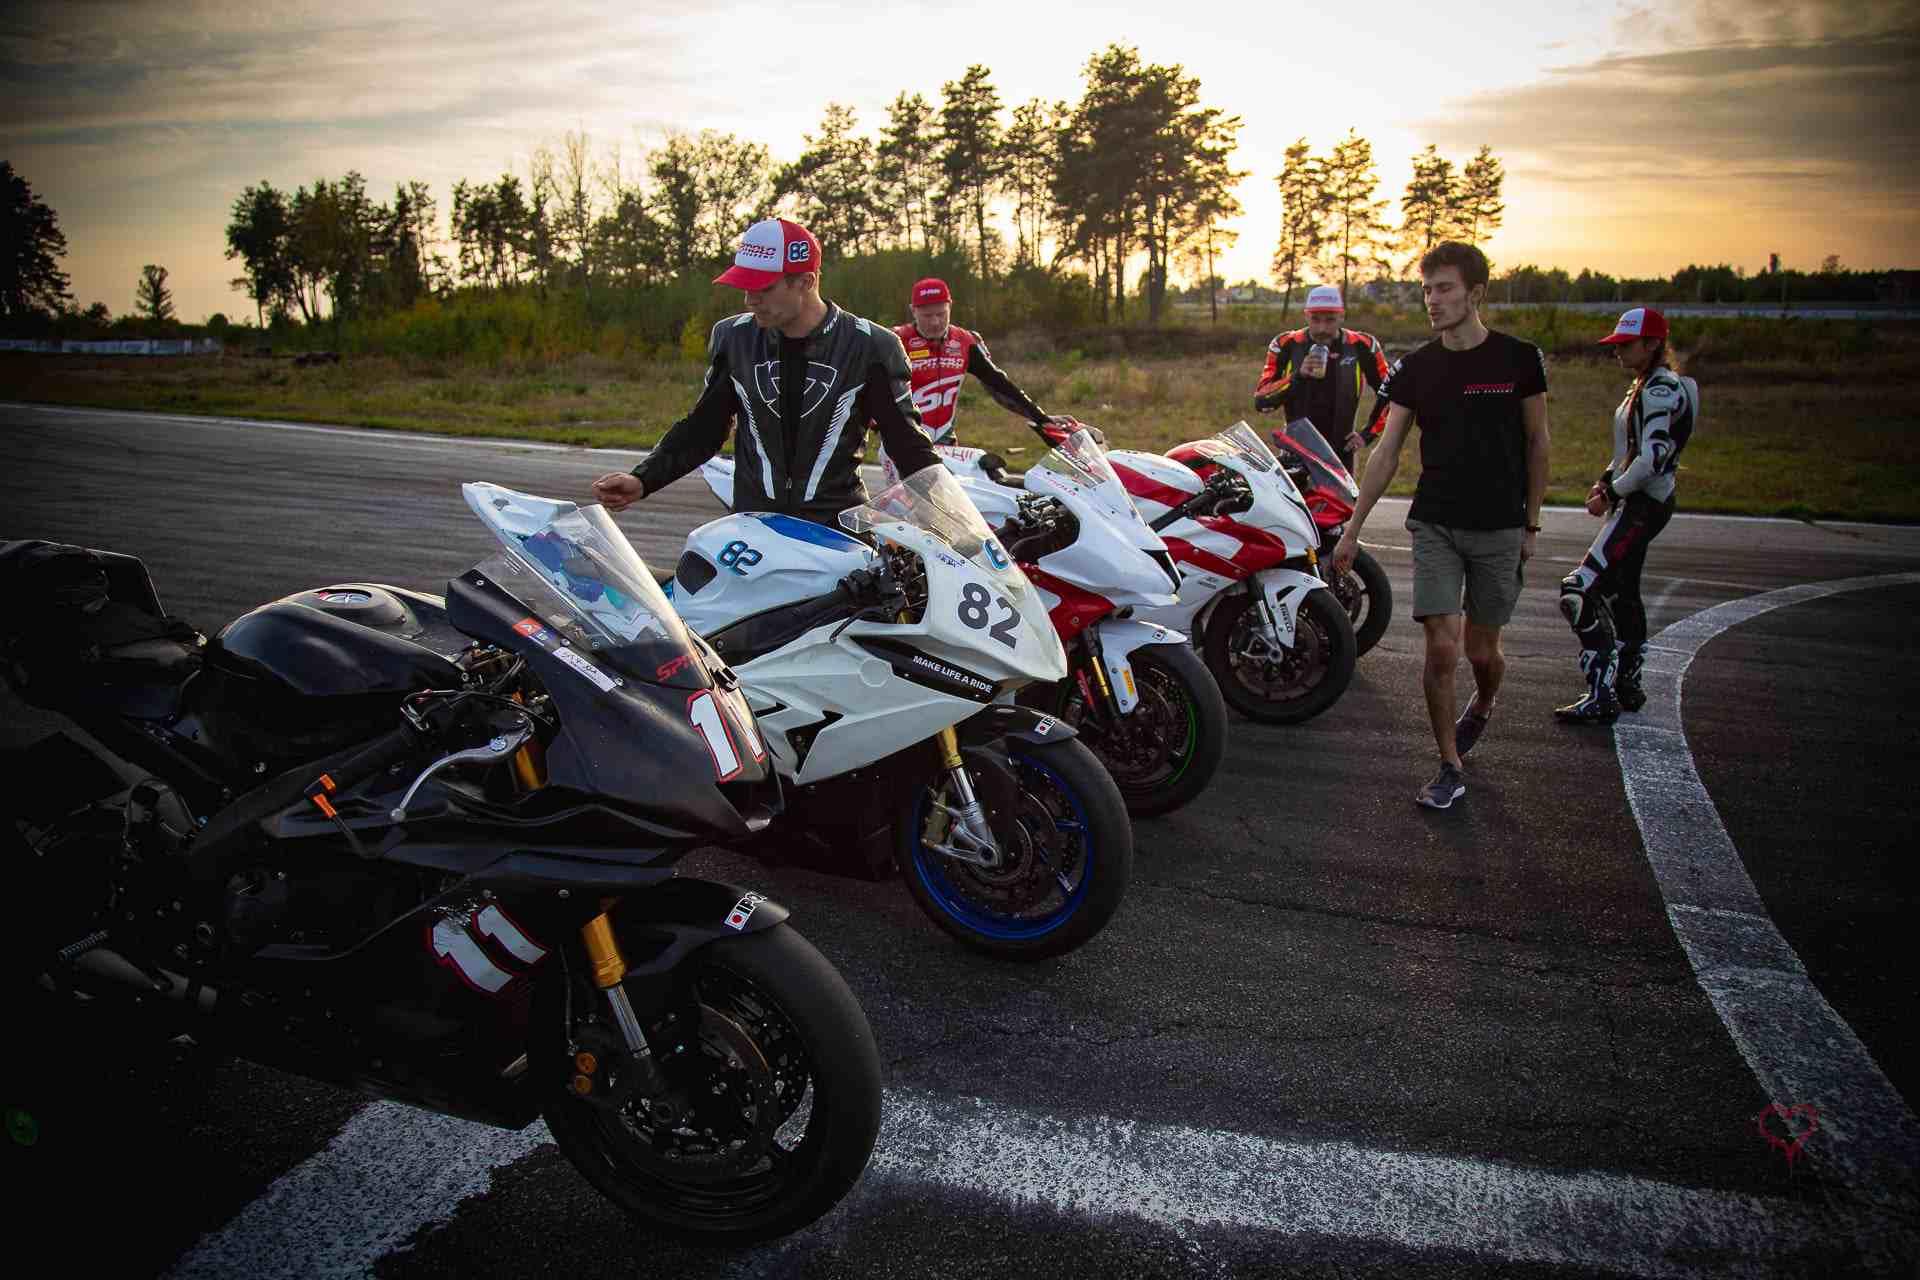 5-6_etap_MotoGPUkraine_150